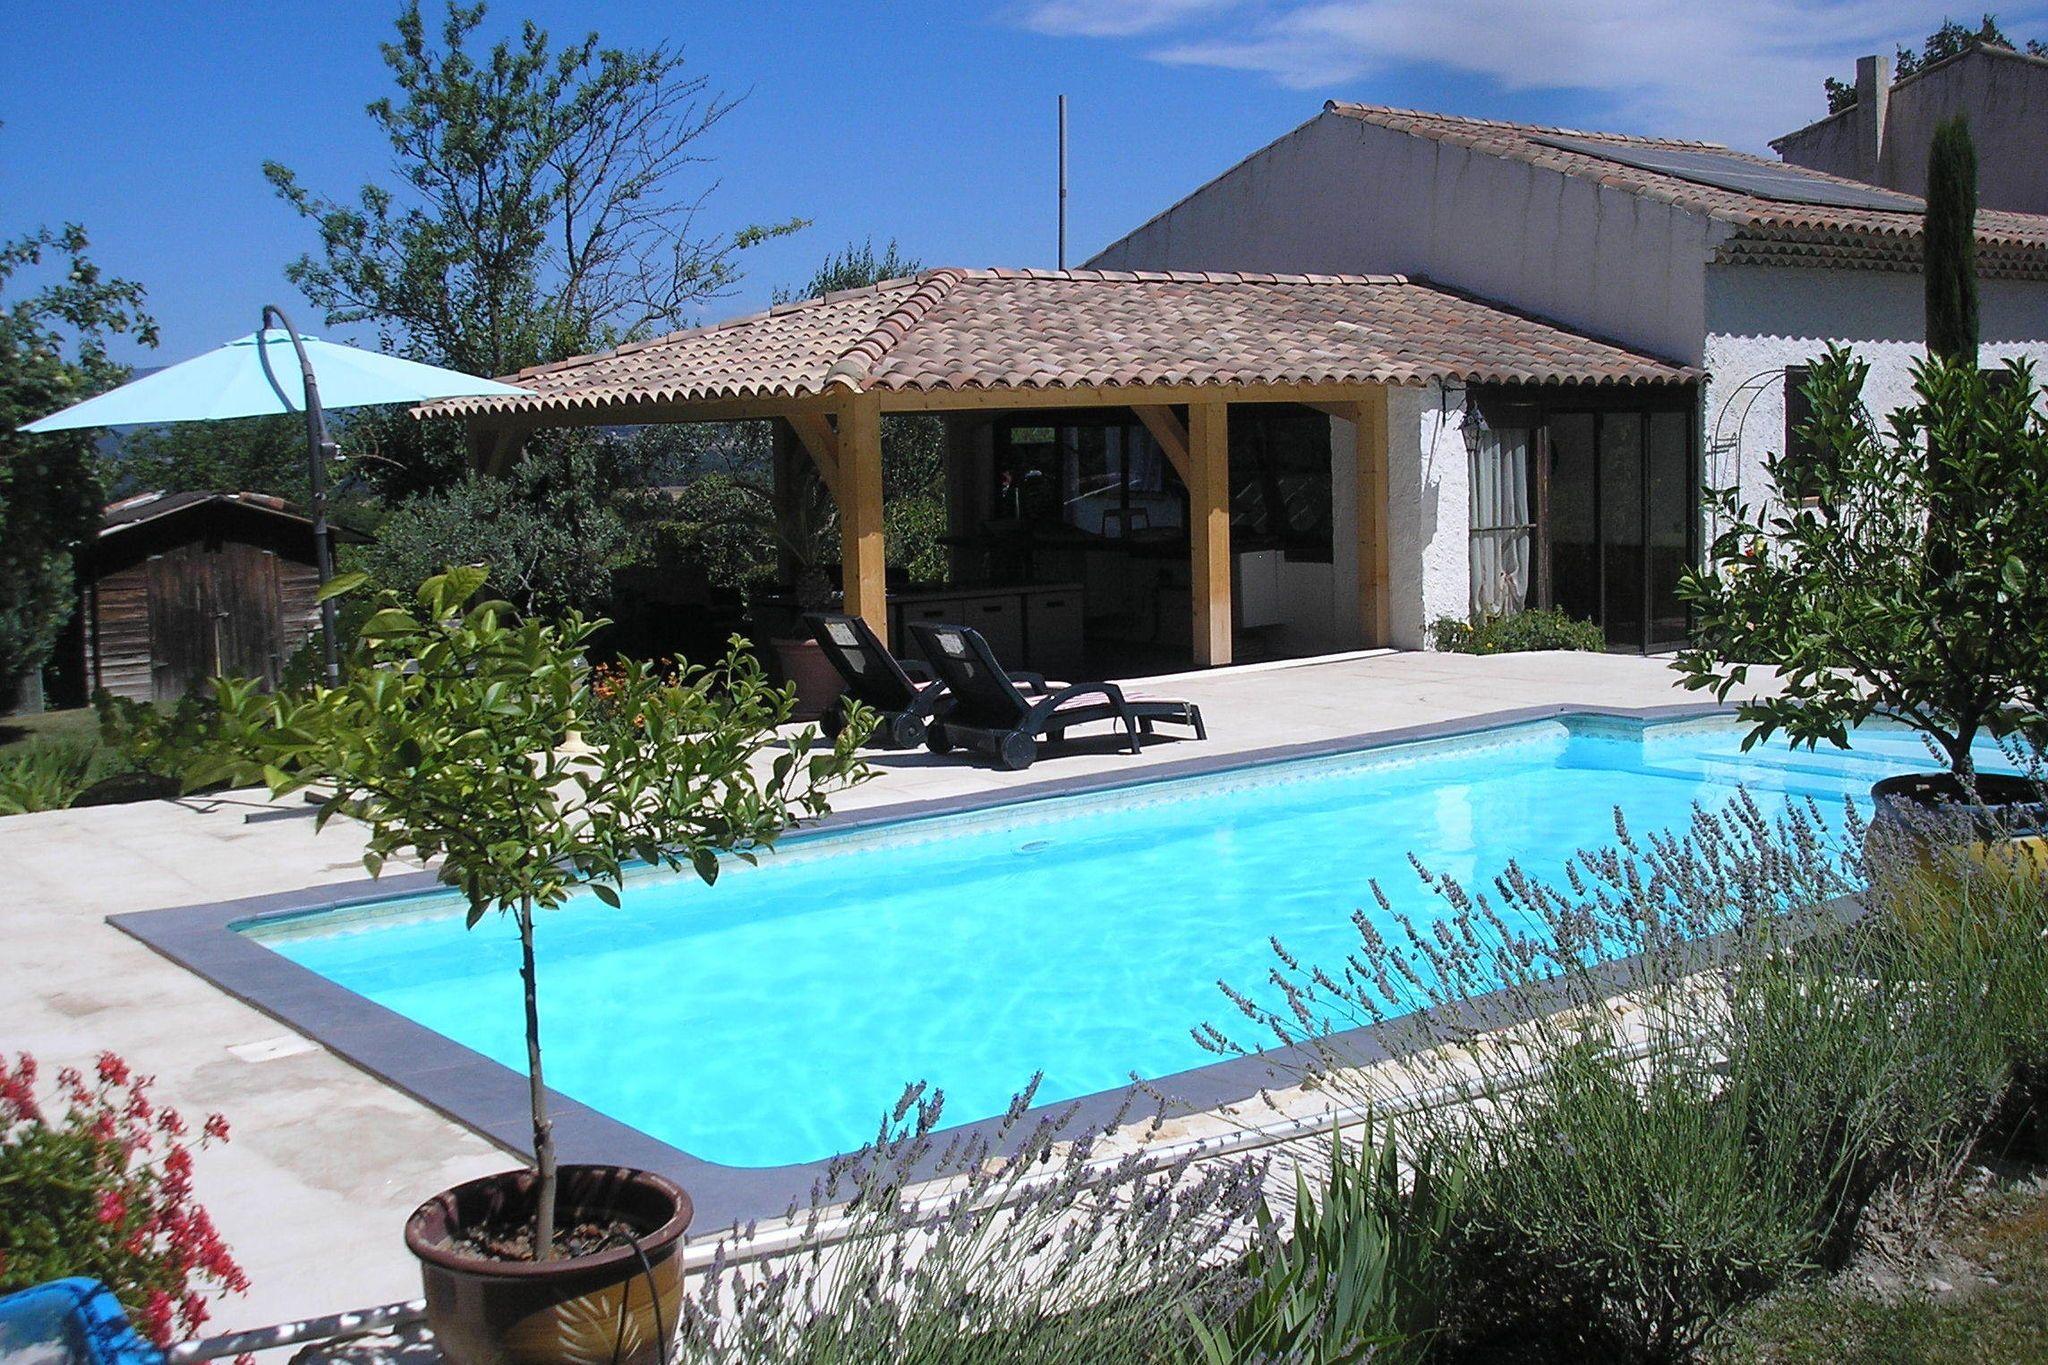 Residencia para 6 huéspedes en Meyrargues